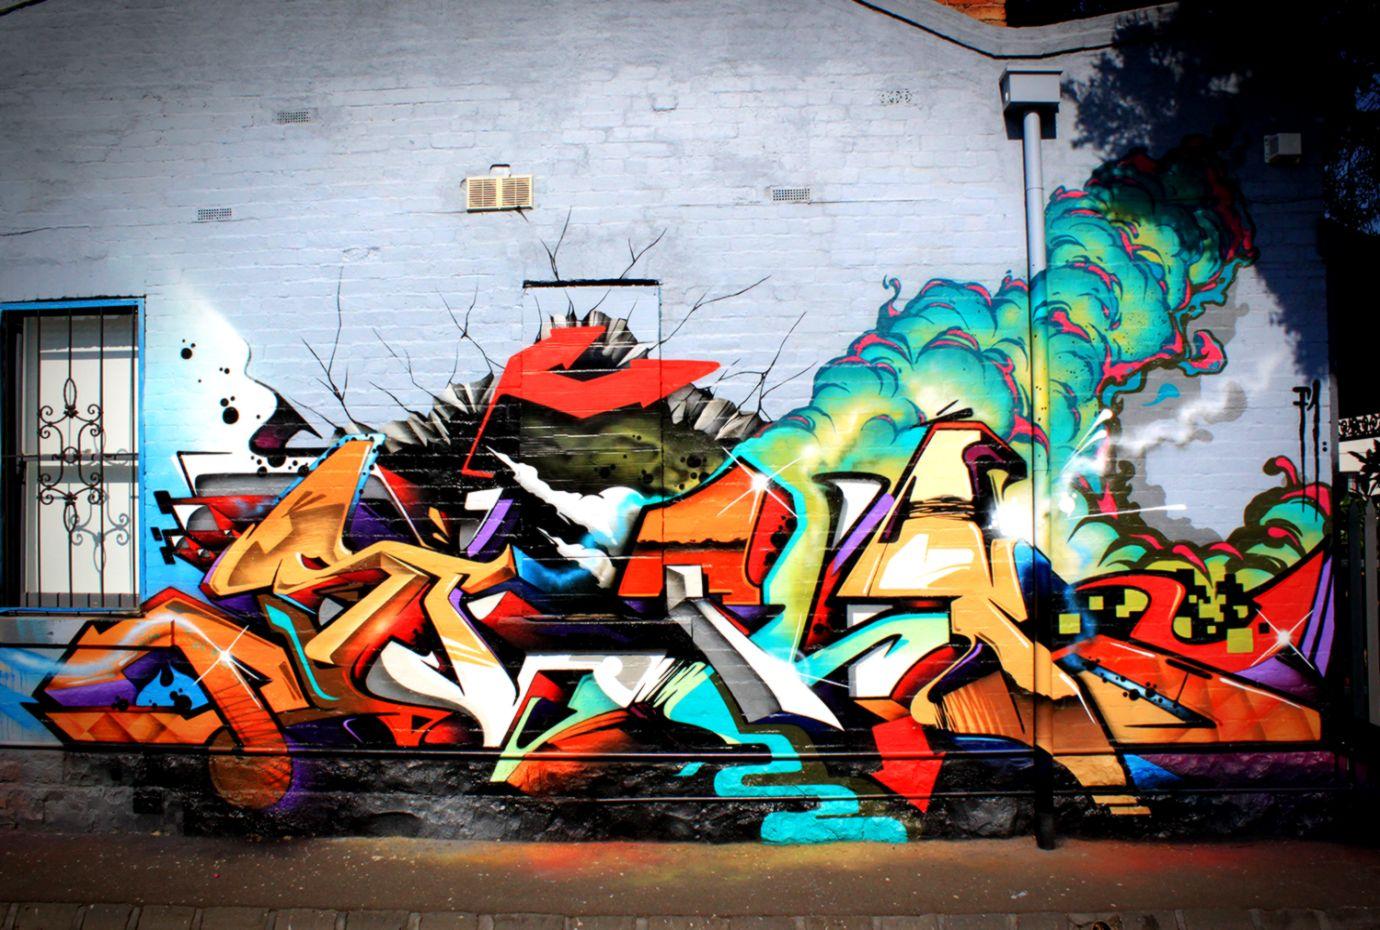 Graffiti Wall Hotel Wallpaper Hd Mikespike123